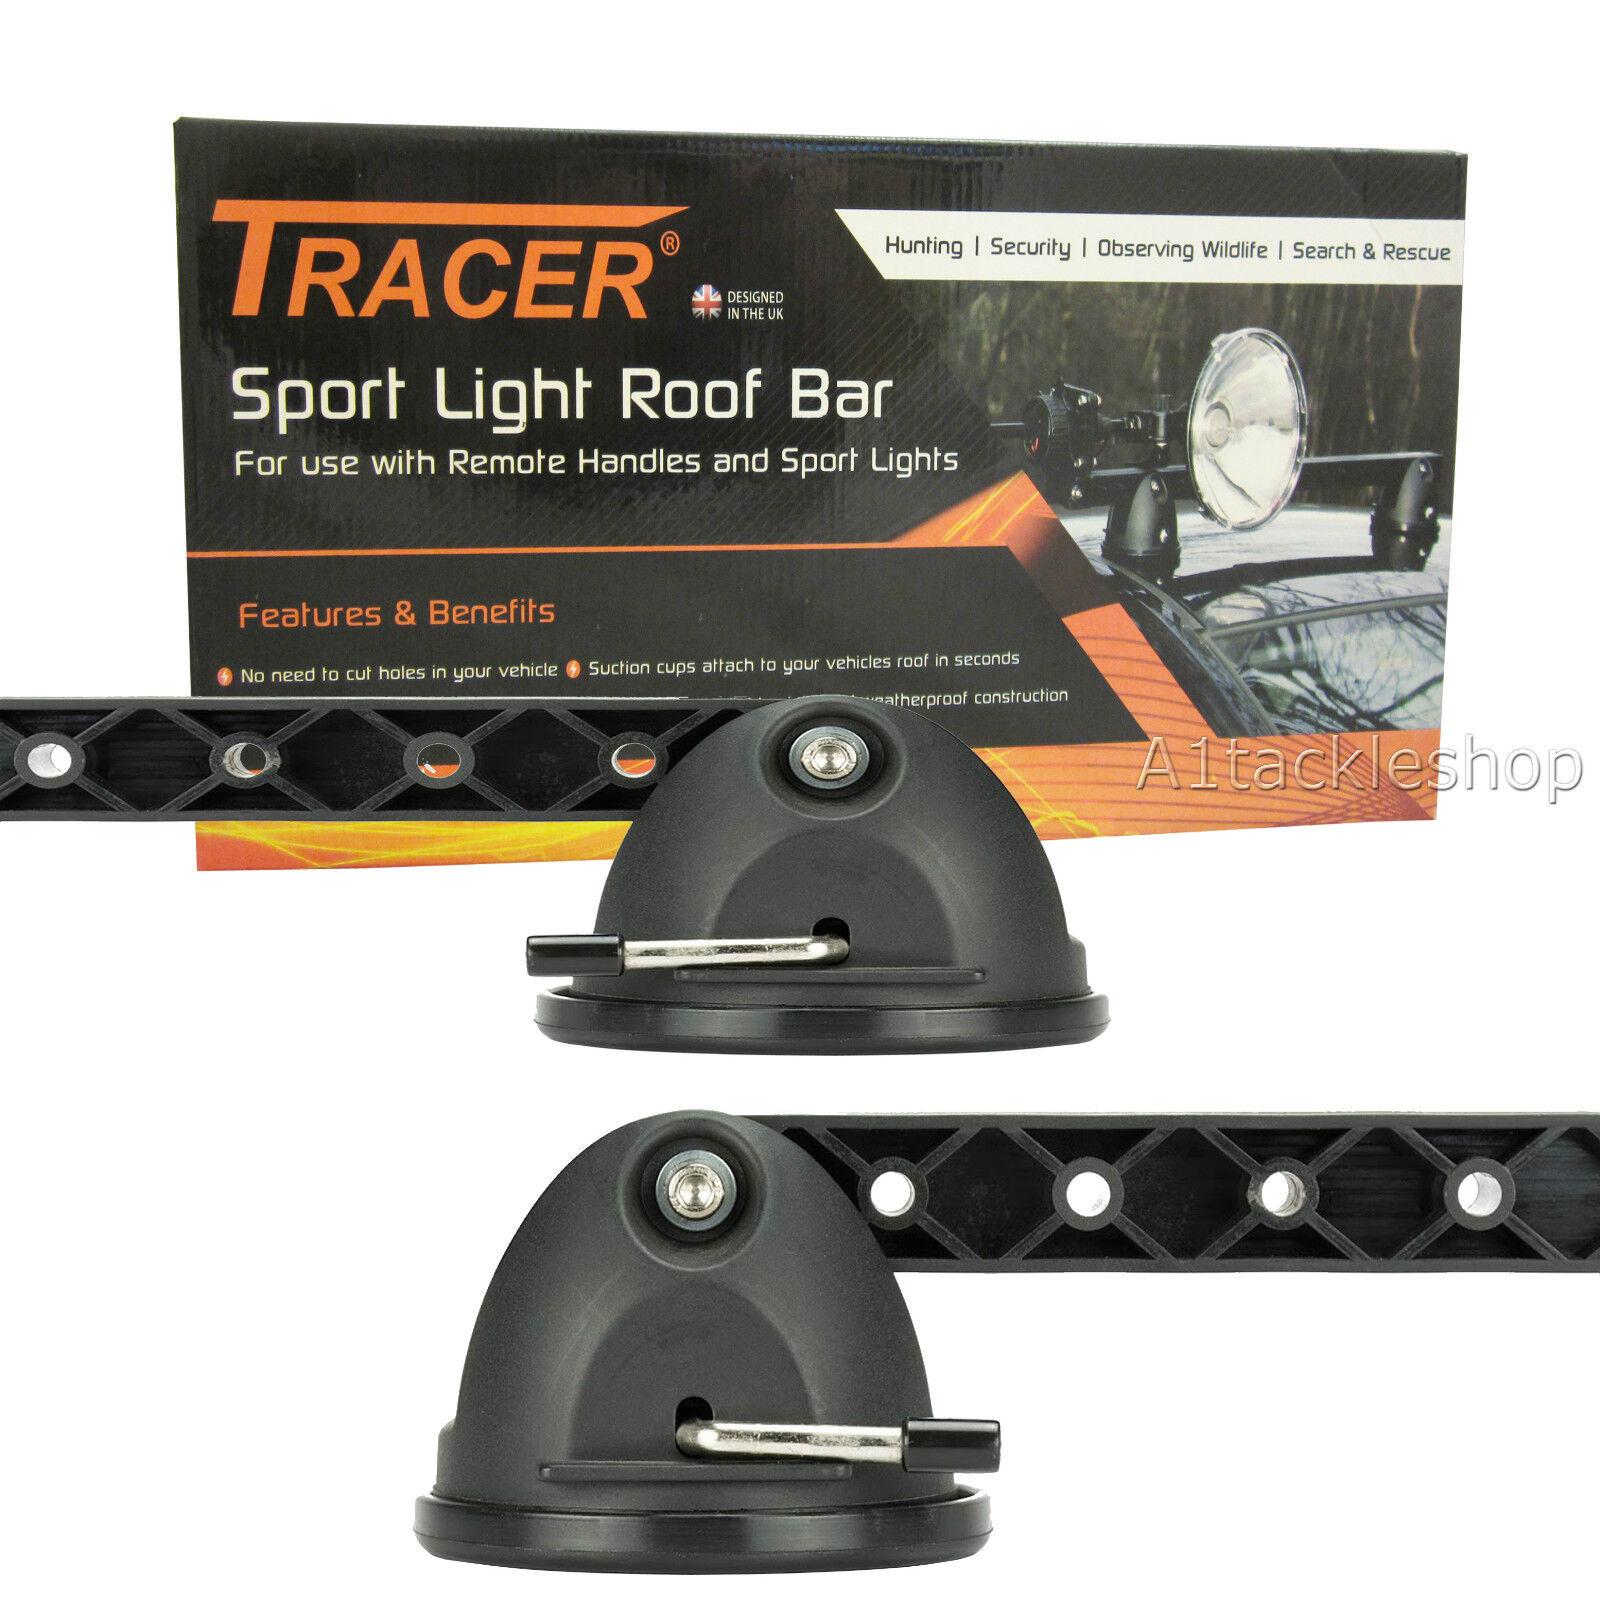 Deben Tracer Sport Light Car Roof Bar for Rabbit and Fox Lamping